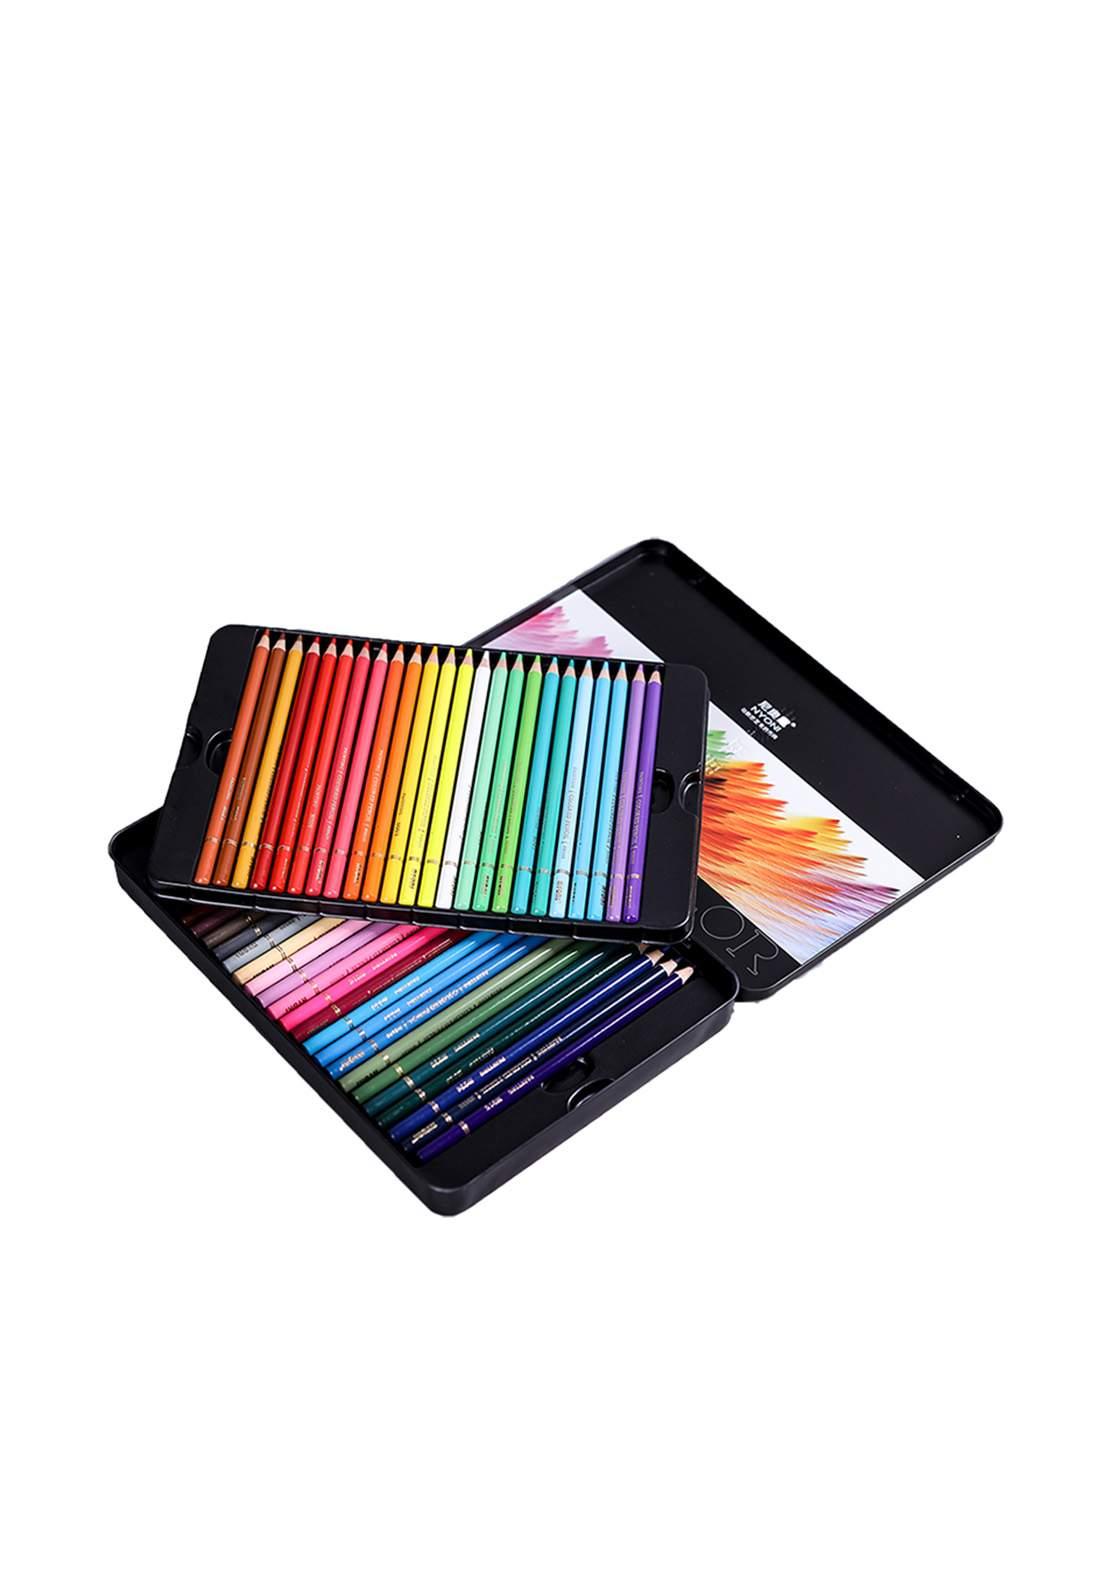 Nyoni Wood Colored Pencil Set 72Pcs اقلام تلوين خشبية